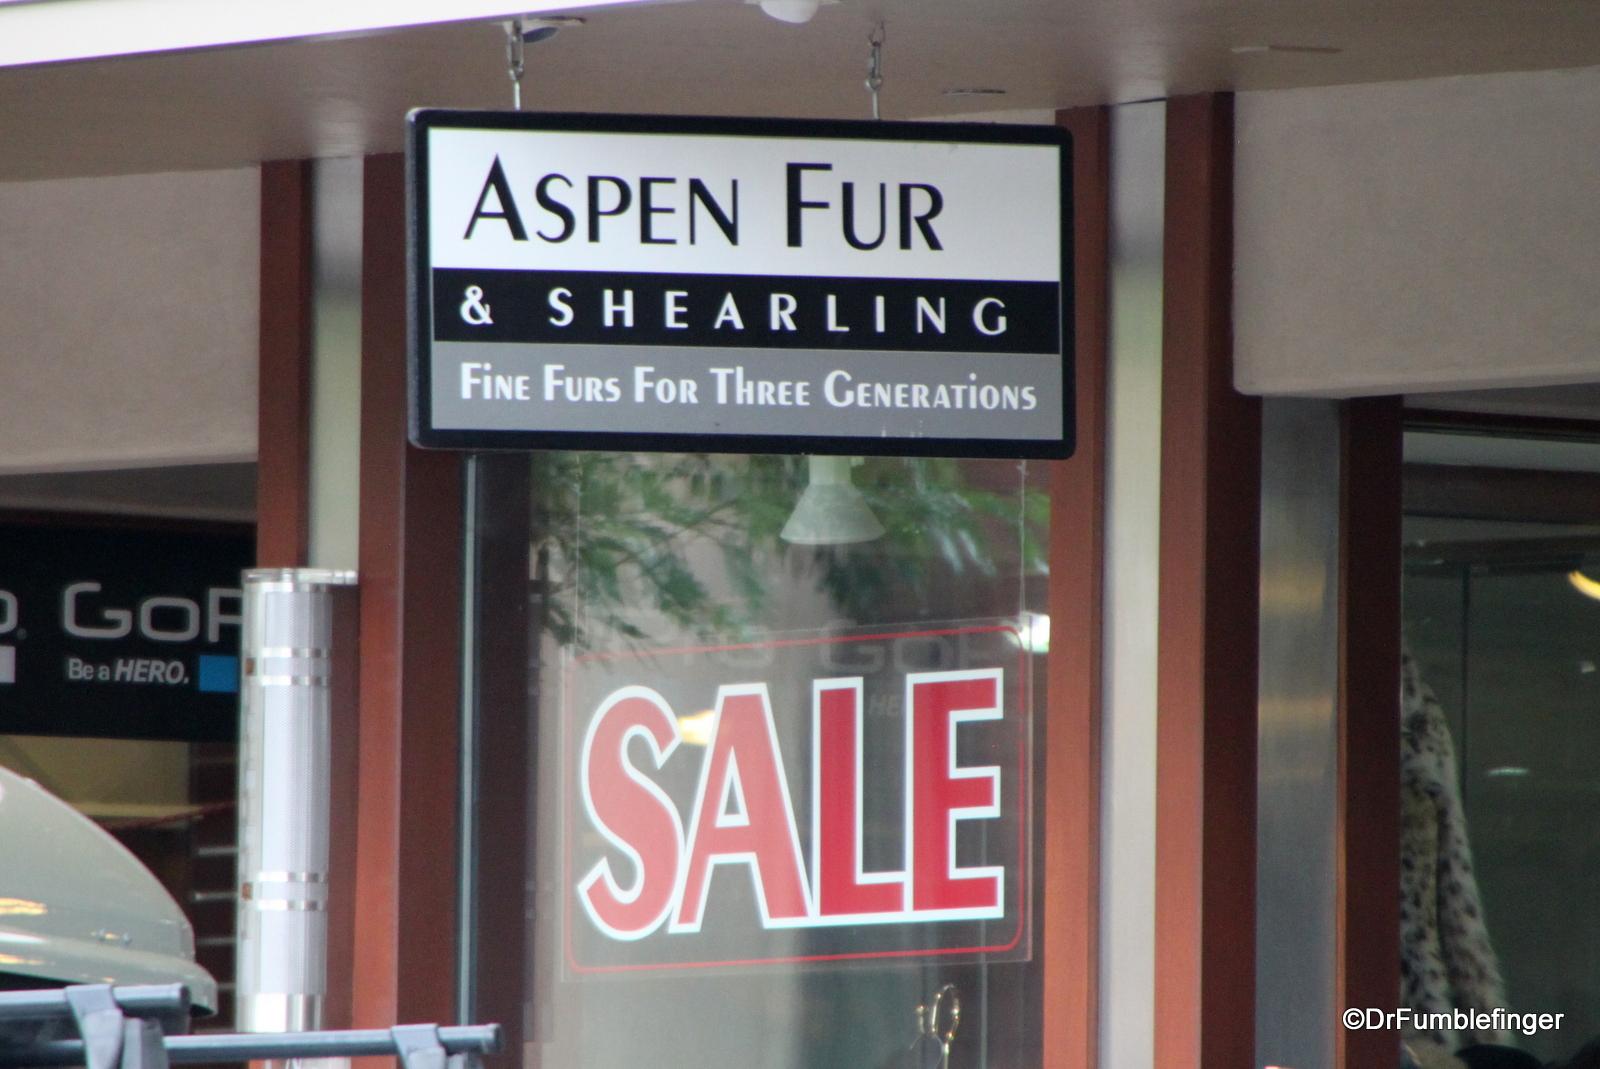 19 Signs of Aspen